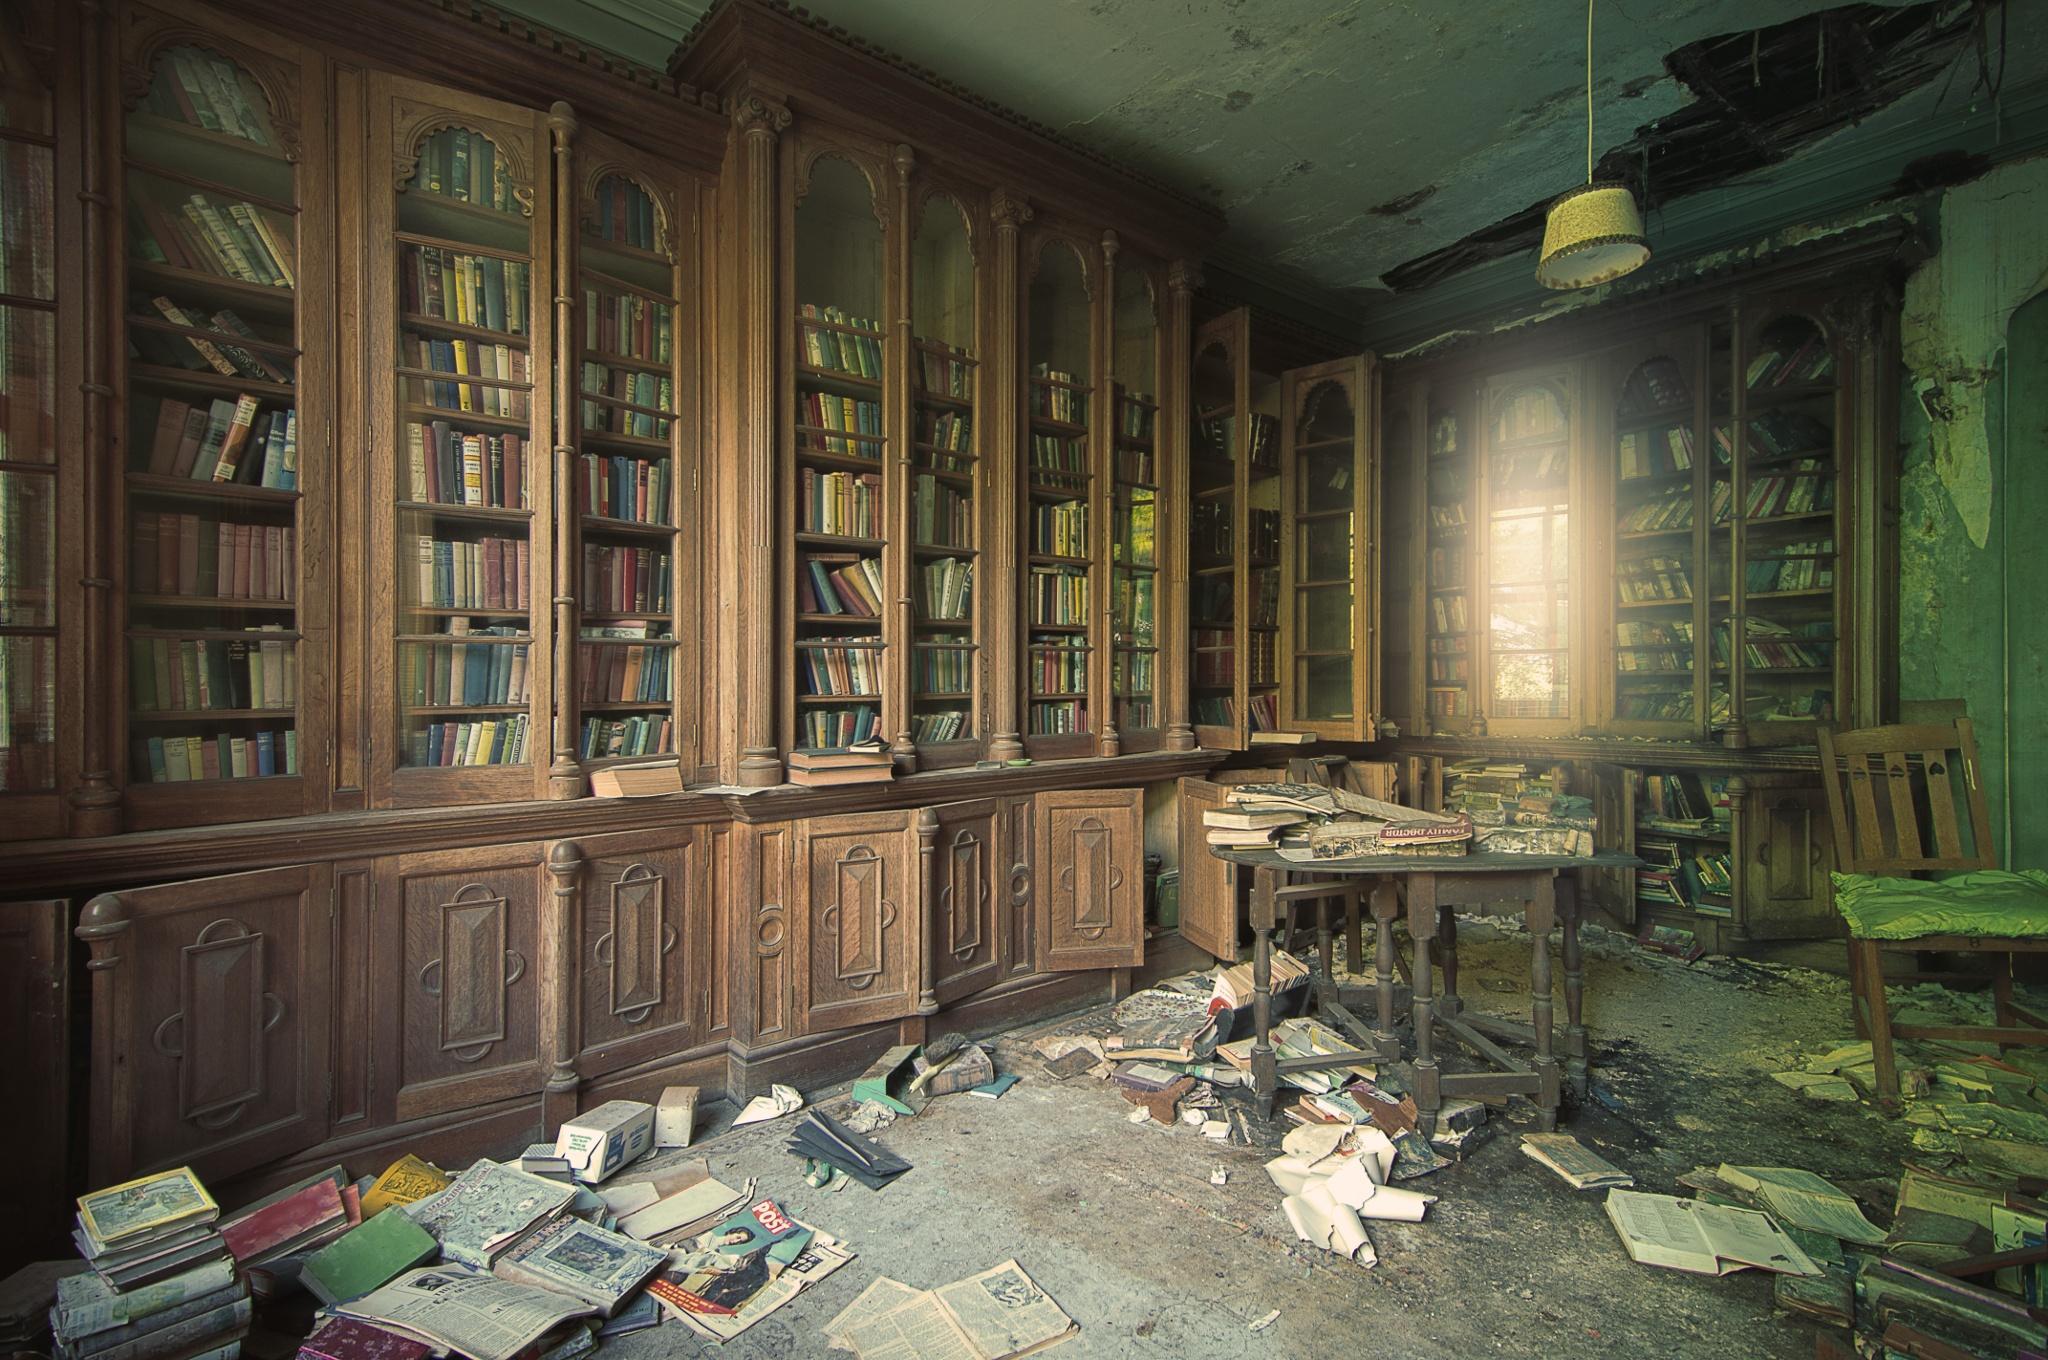 Wallpaper Building Abandoned Interior James Charlick